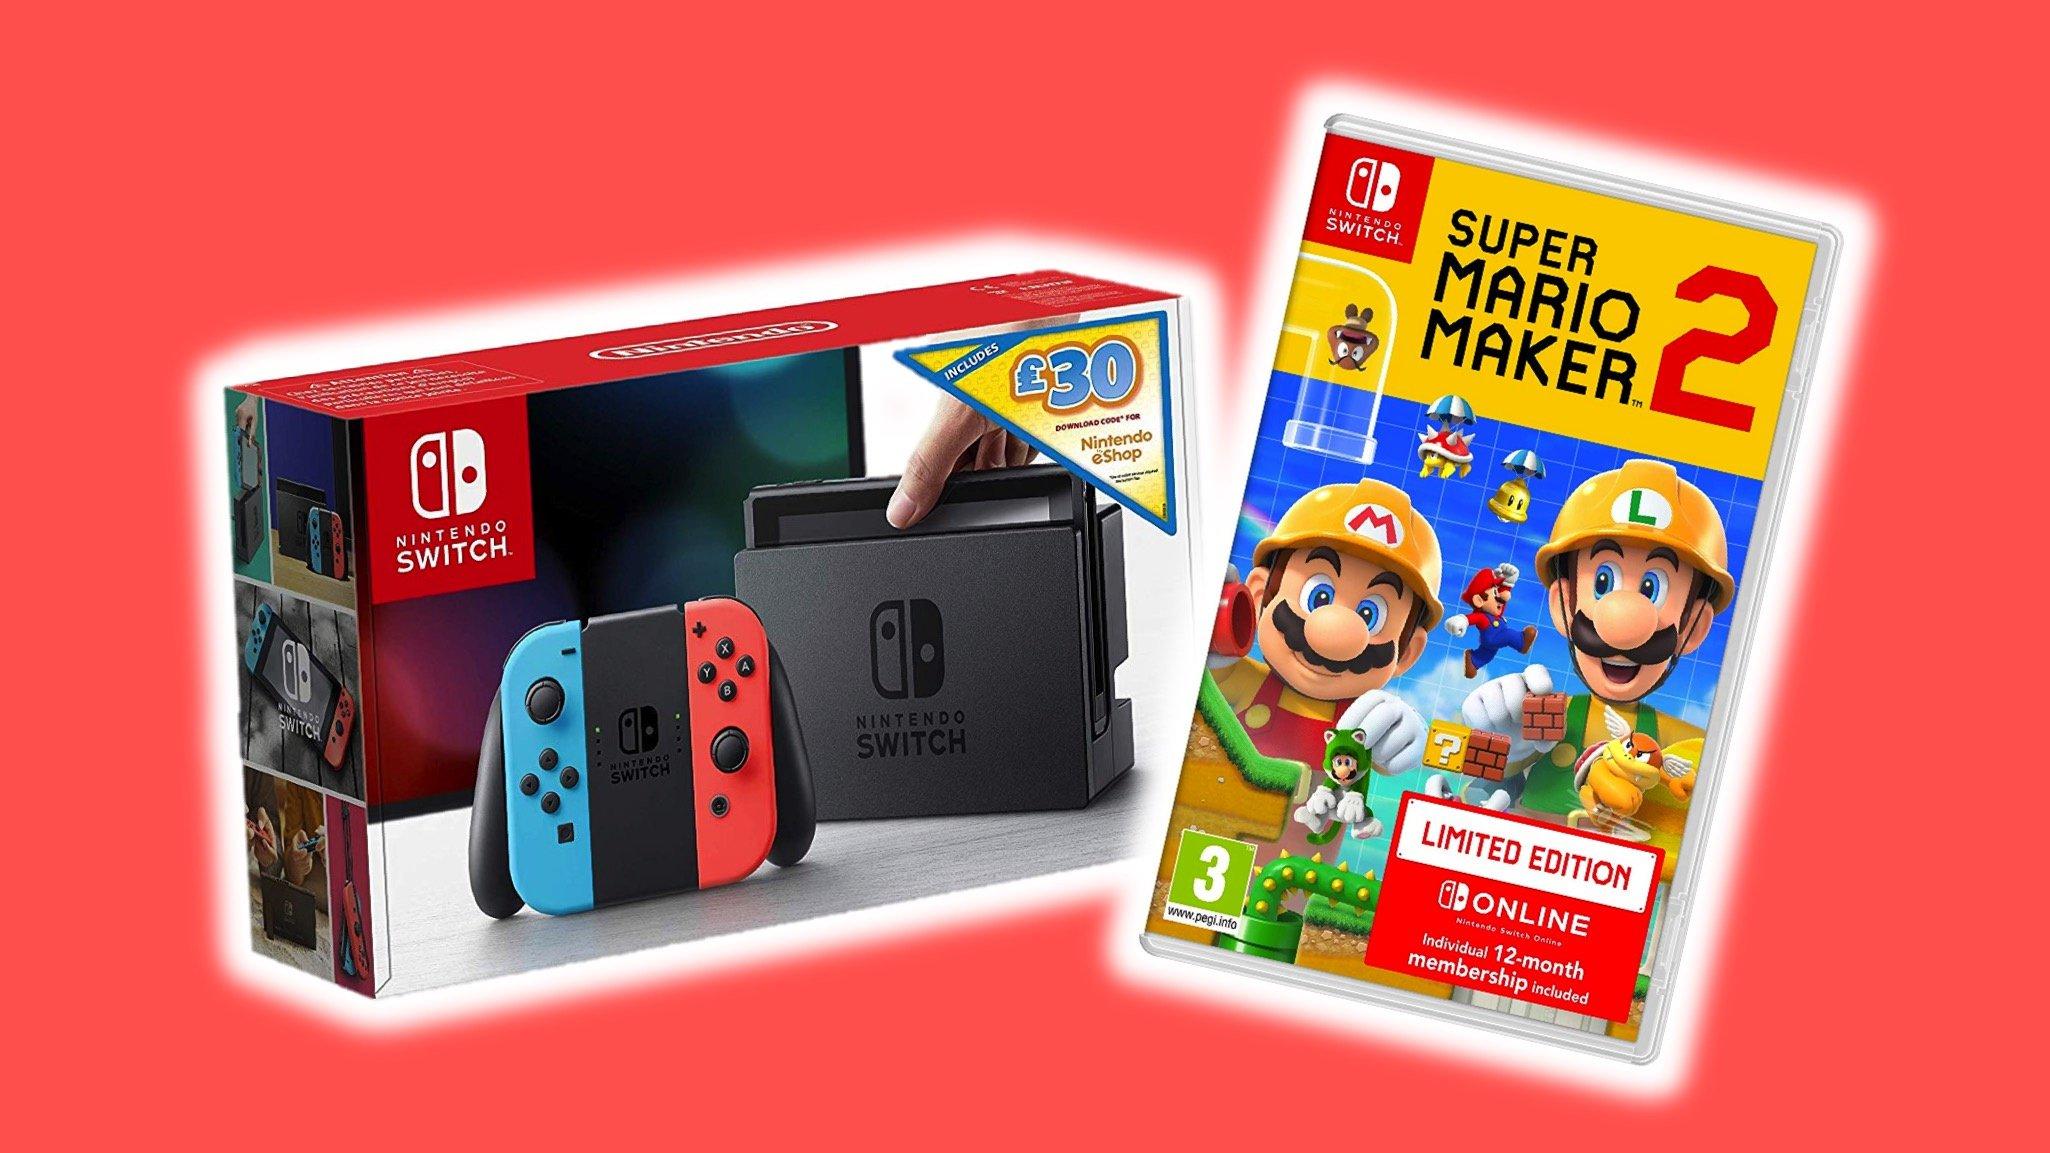 Deals: Get A Nintendo Switch, Super Mario Maker 2 And 12